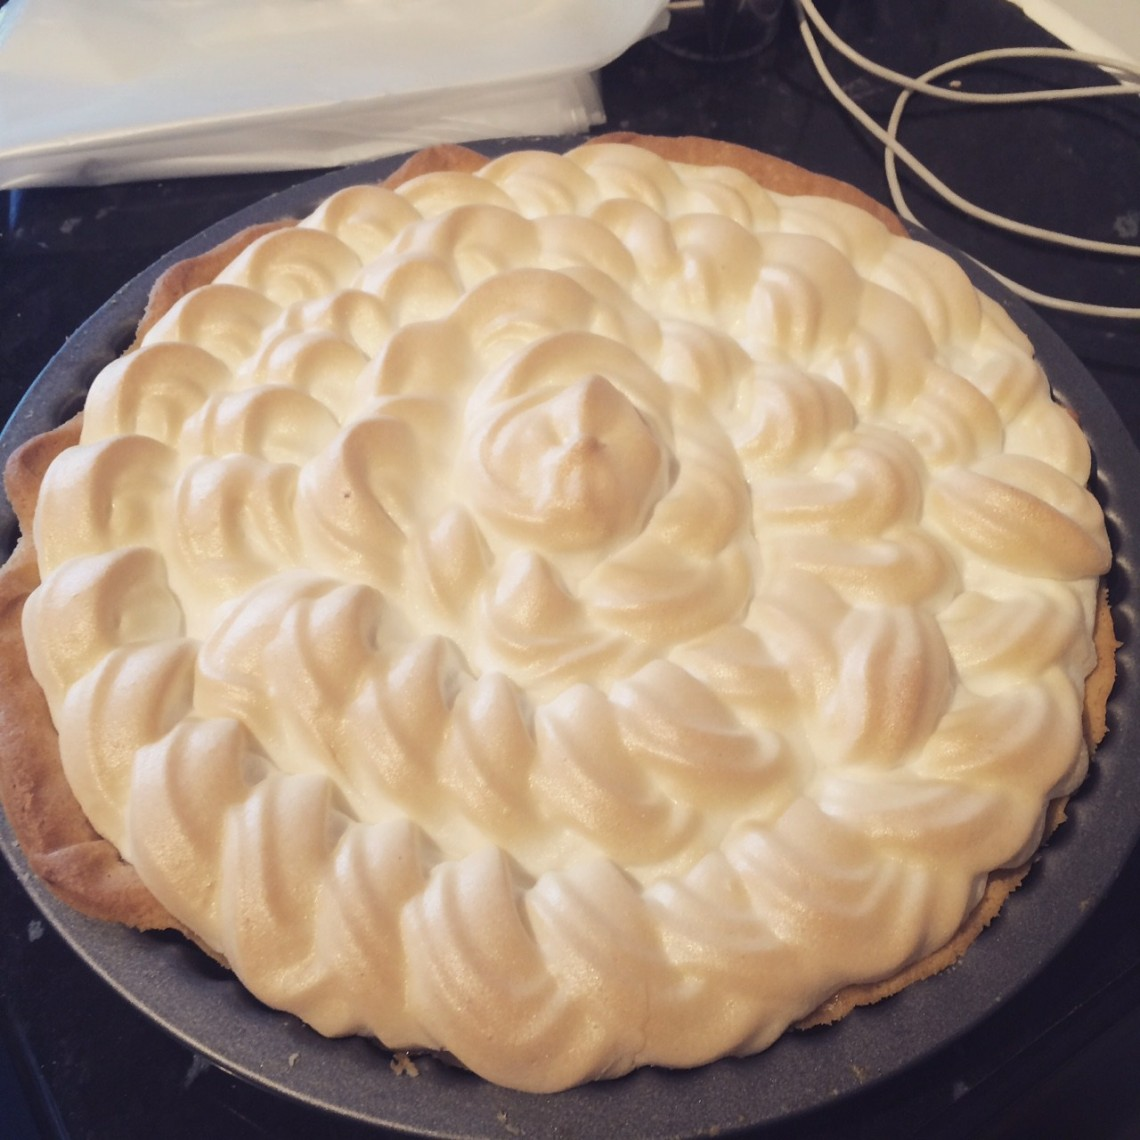 BOTW lemon meringue pie